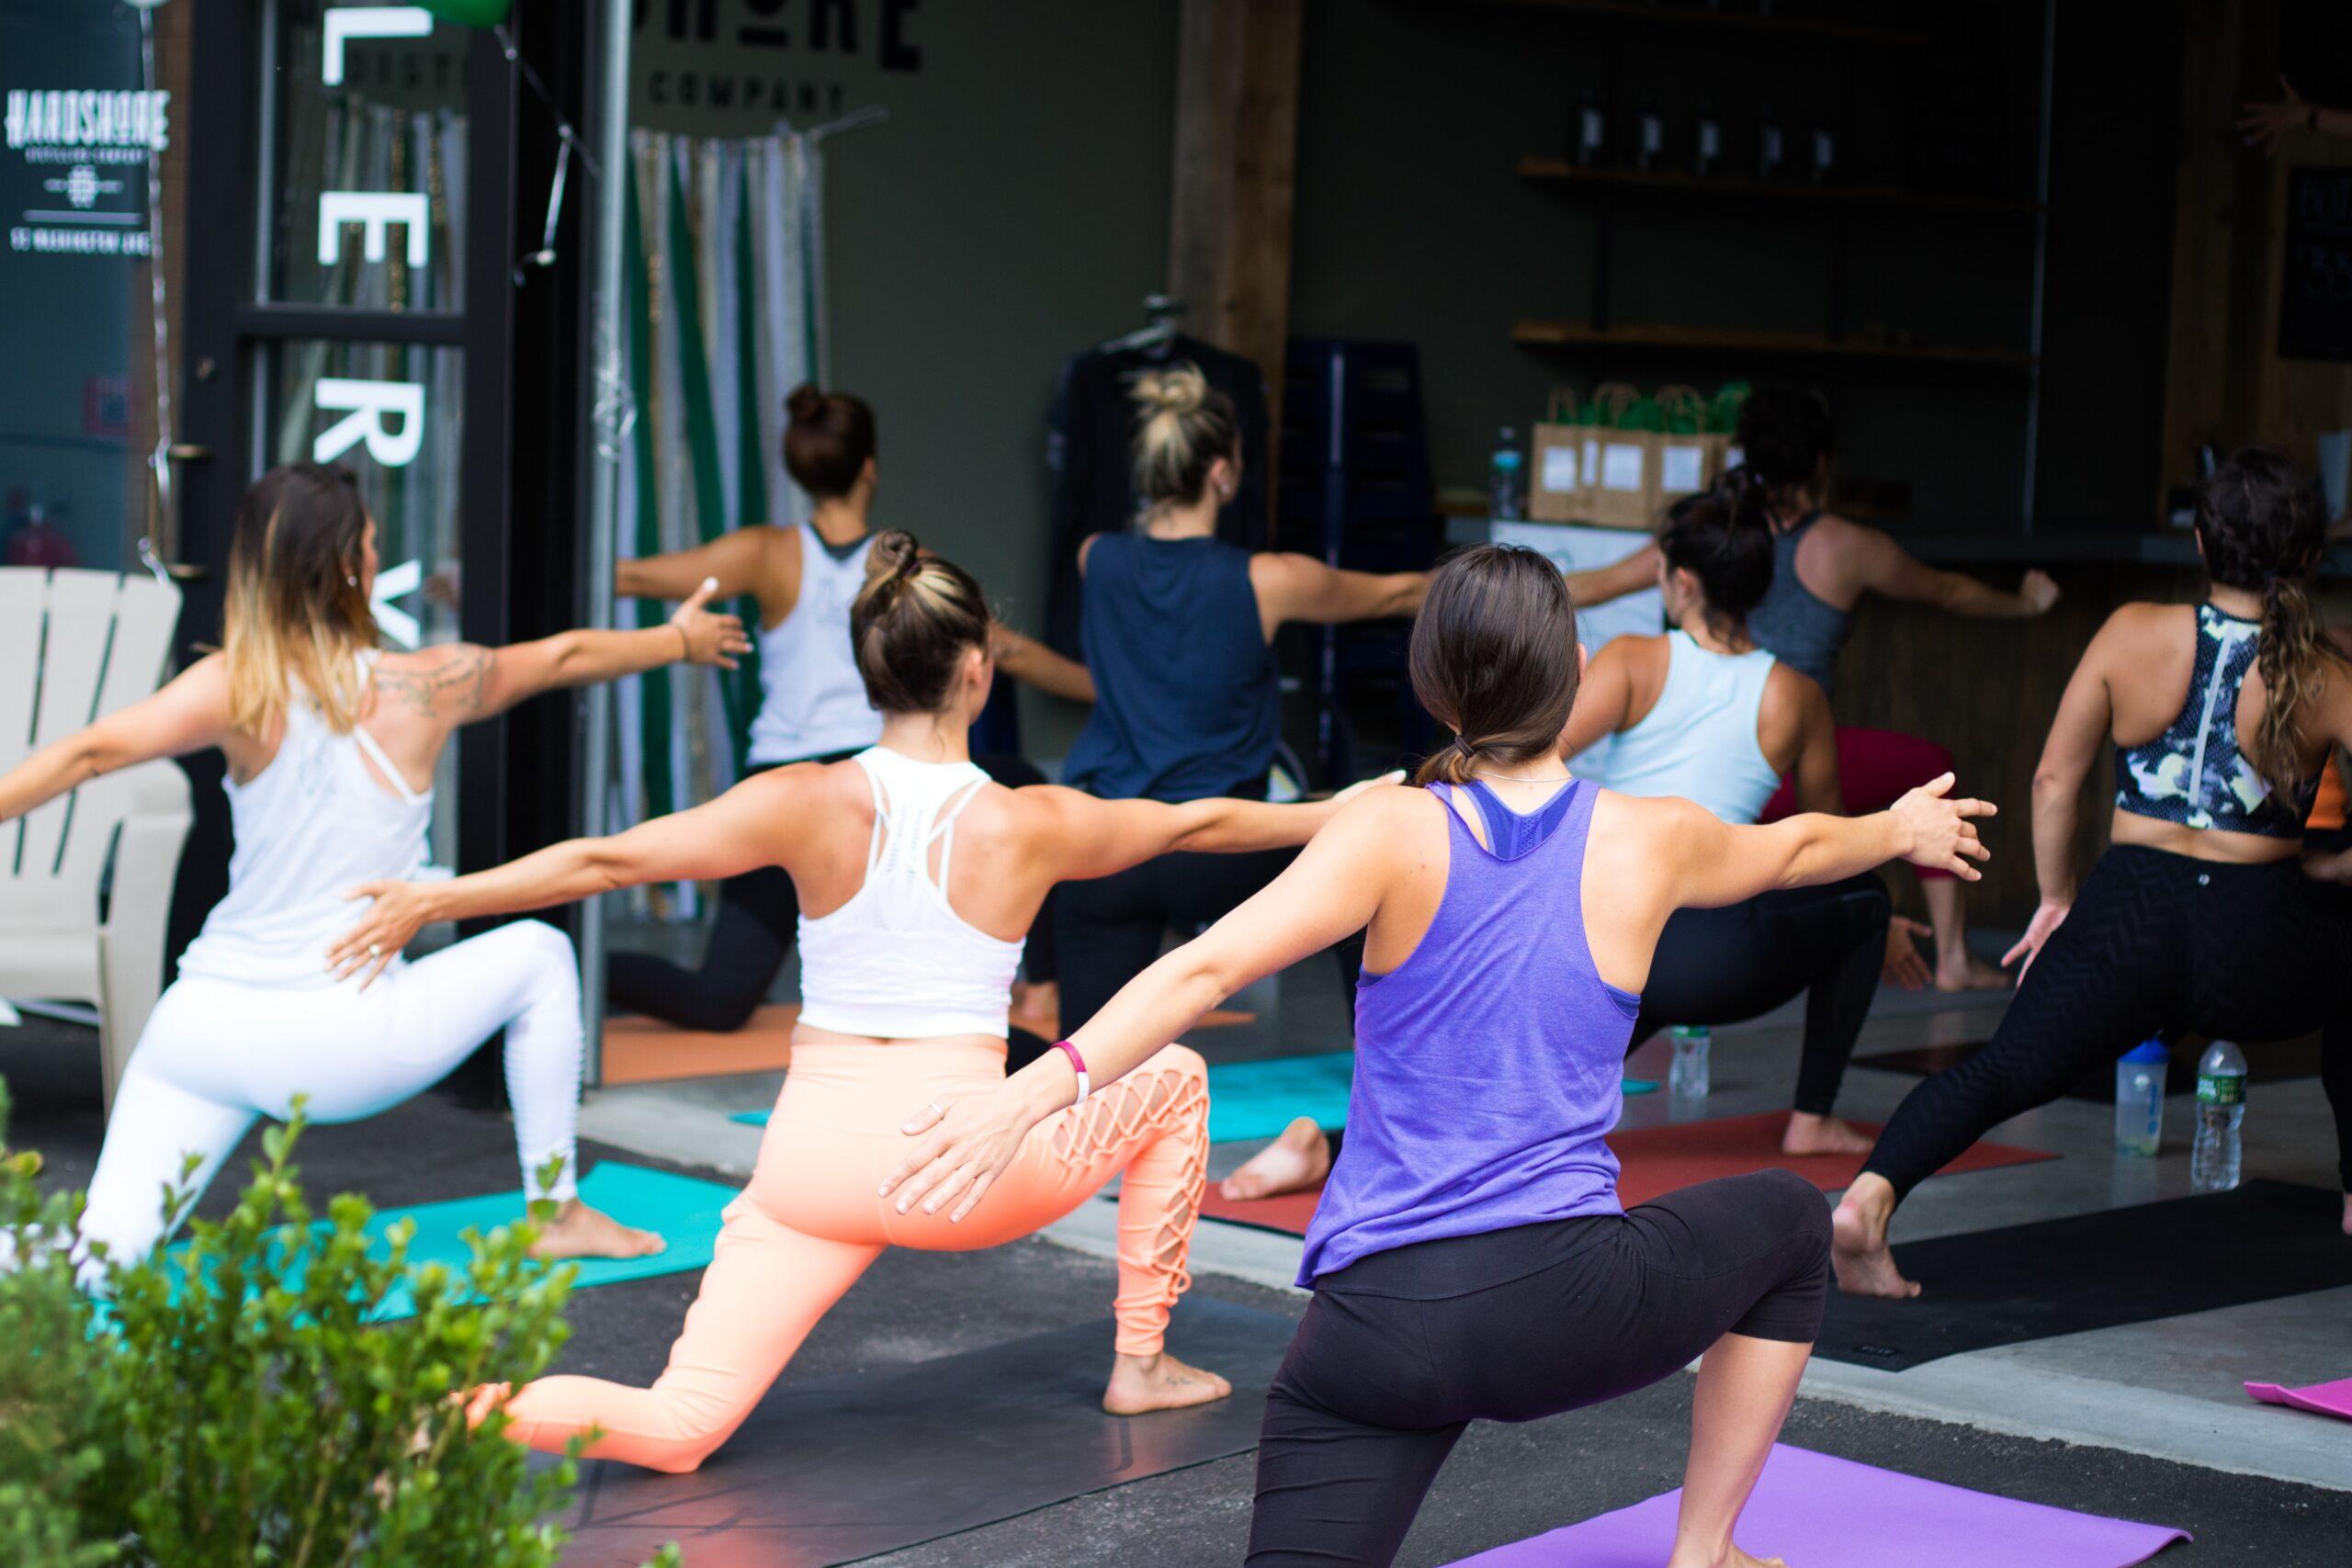 dylan-gillis-Yoga class i Warrior 1 pose -unsplash